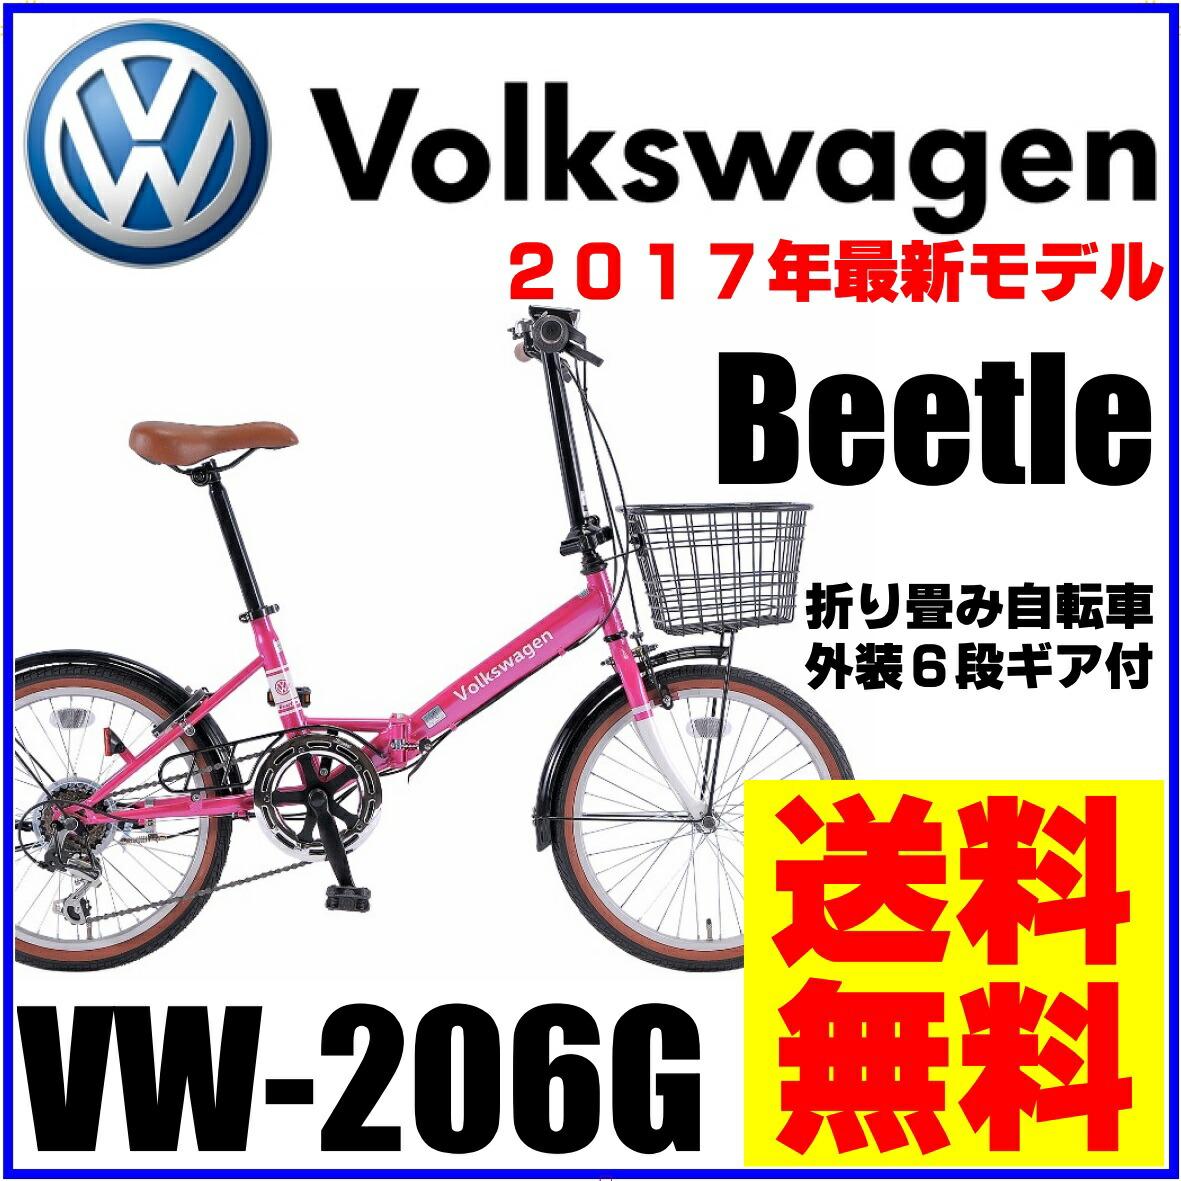 BAA 折りたたみ自転車 フォルクスワーゲン Volkswagen 自転車 ピンク 20インチ 自転車 外装6段ギア フォルクスワーゲン VW-206G Beetle ビートル